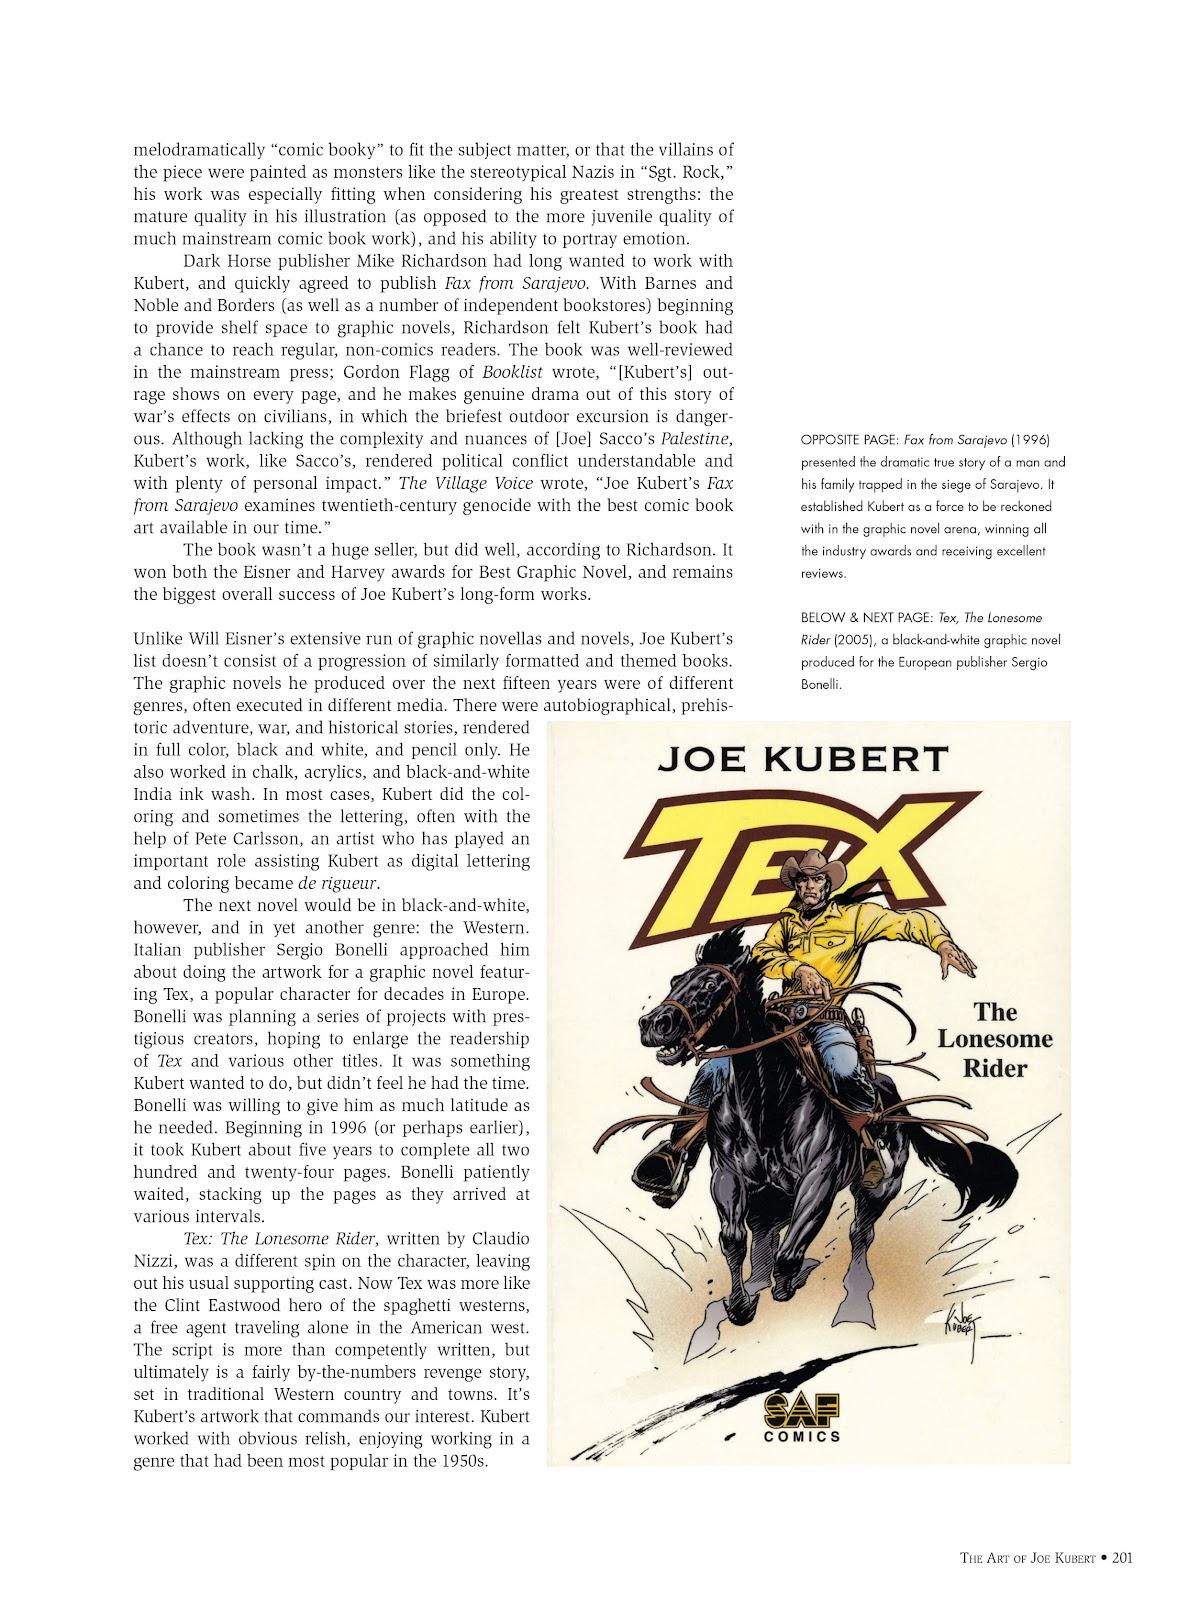 Read online The Art of Joe Kubert comic -  Issue # TPB (Part 3) - 1